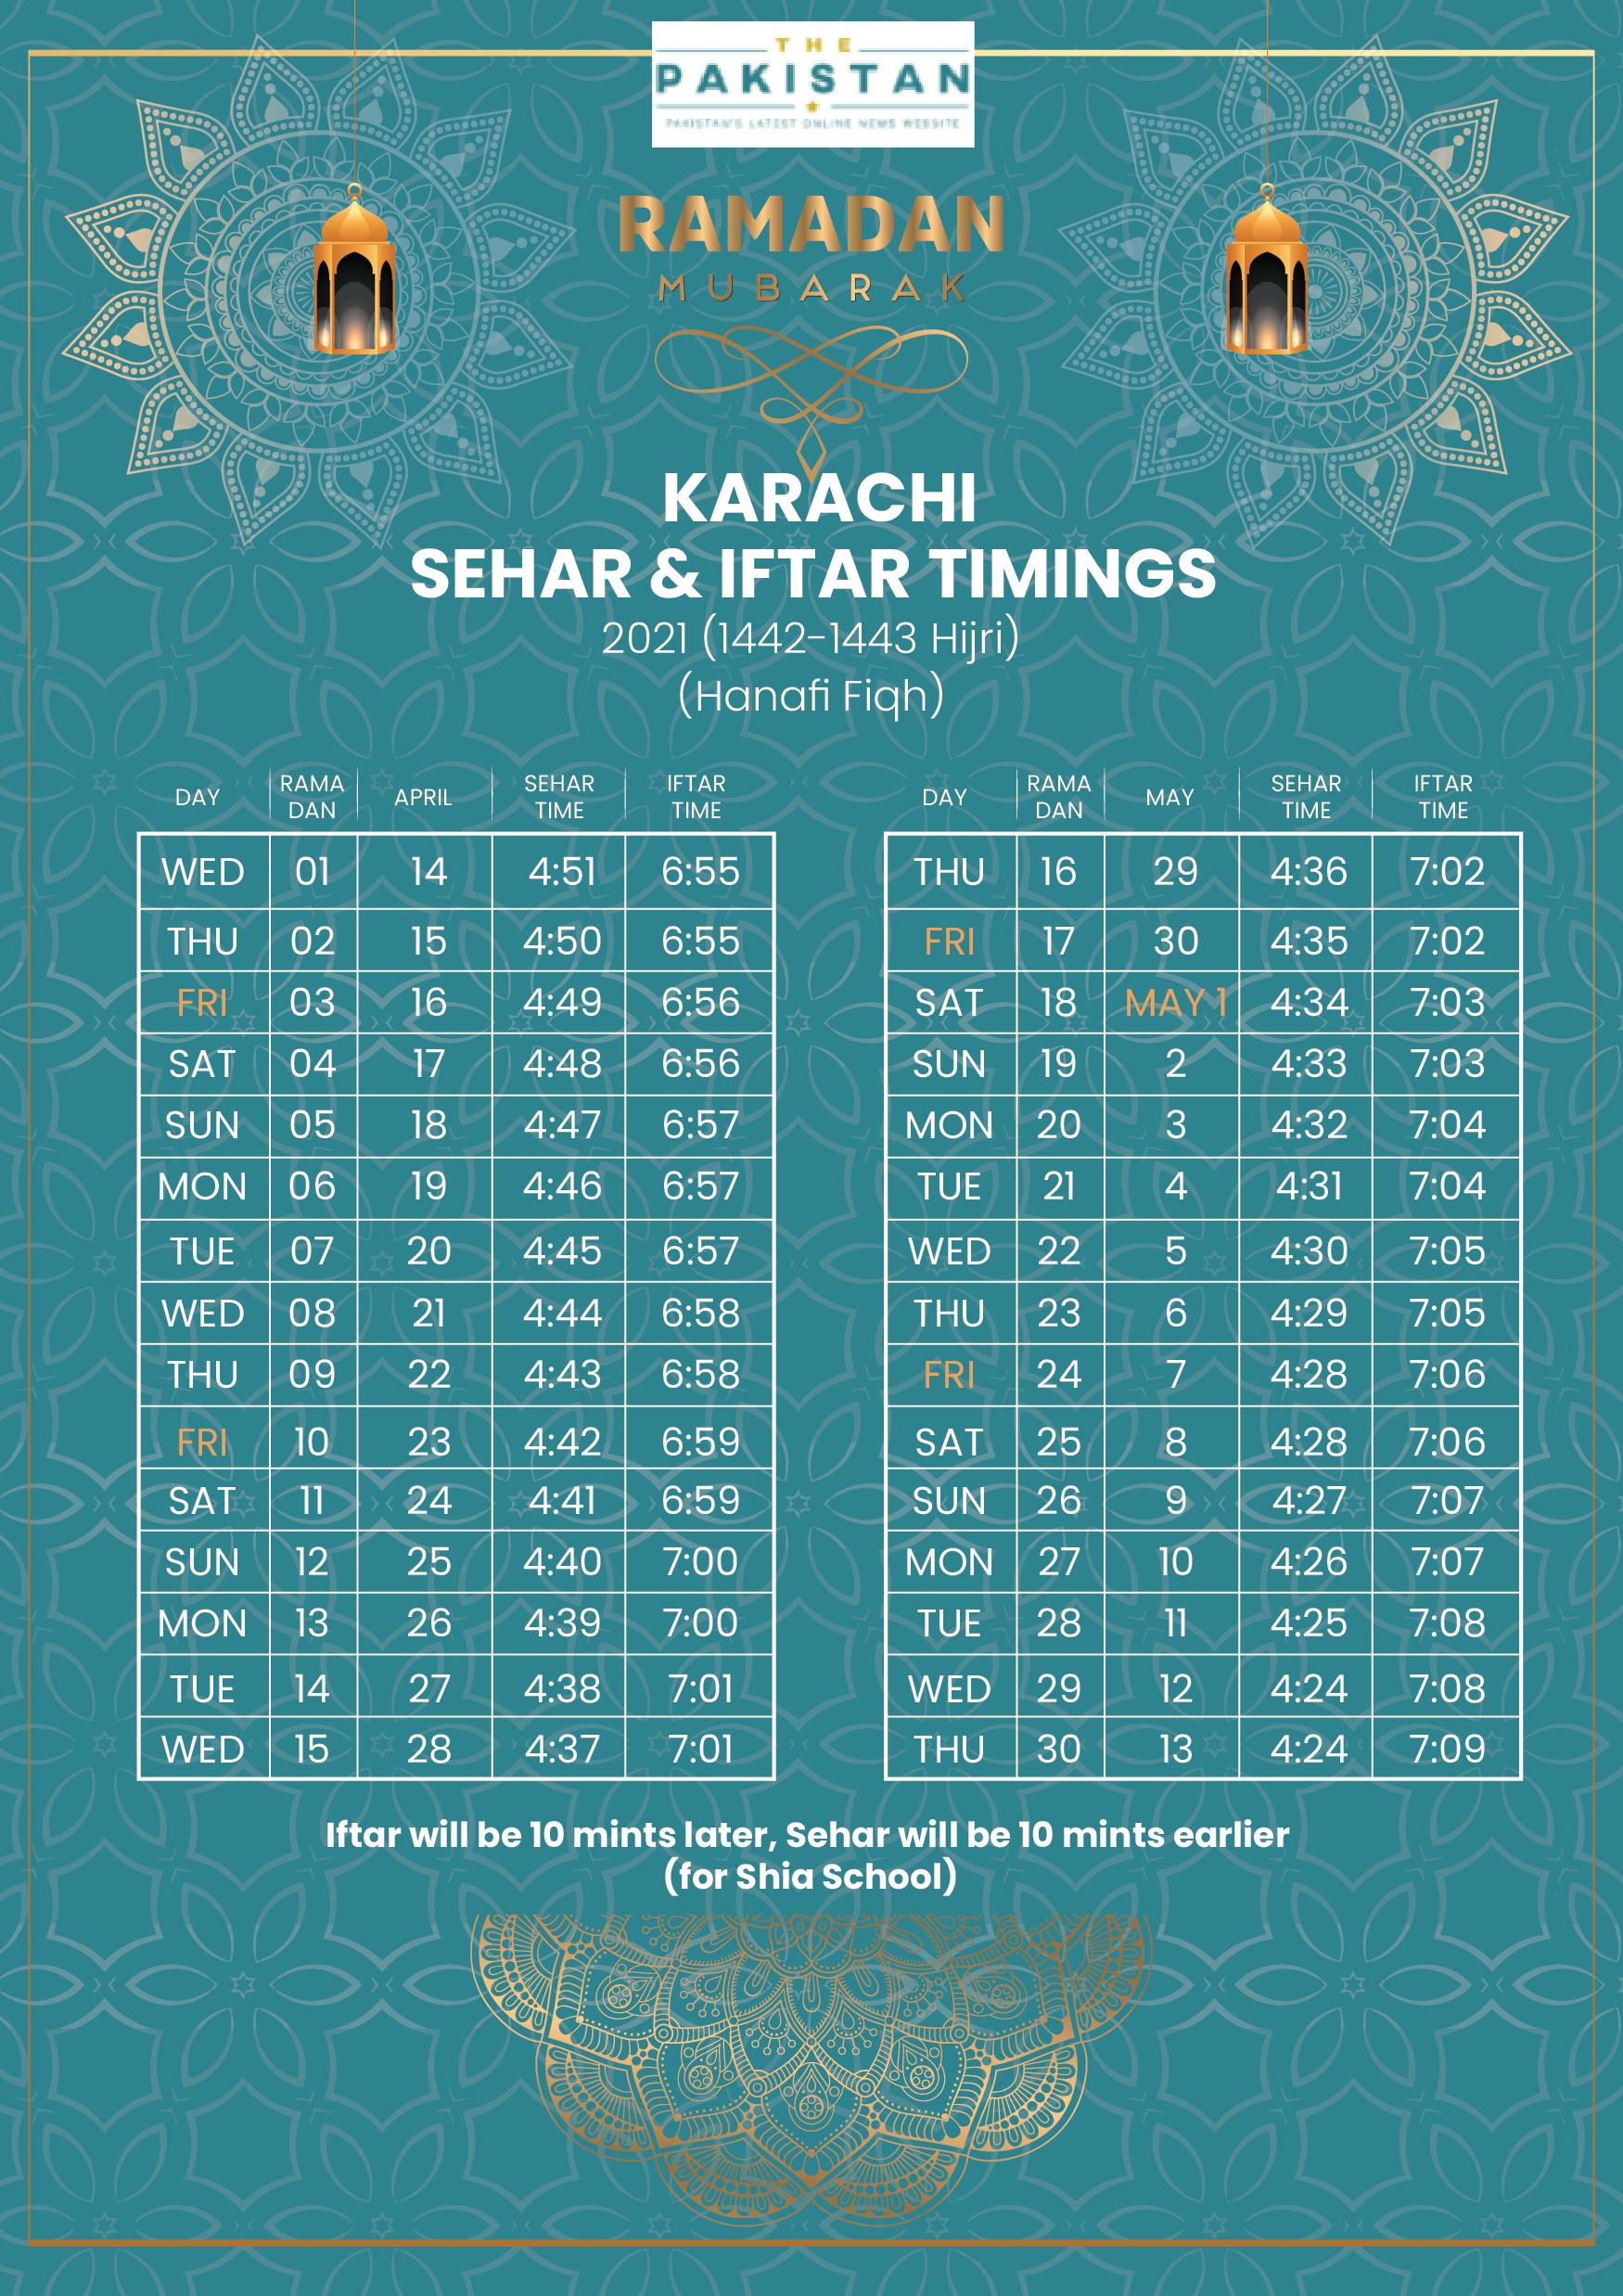 SEHRI & IFTAR TIME - KARACHI